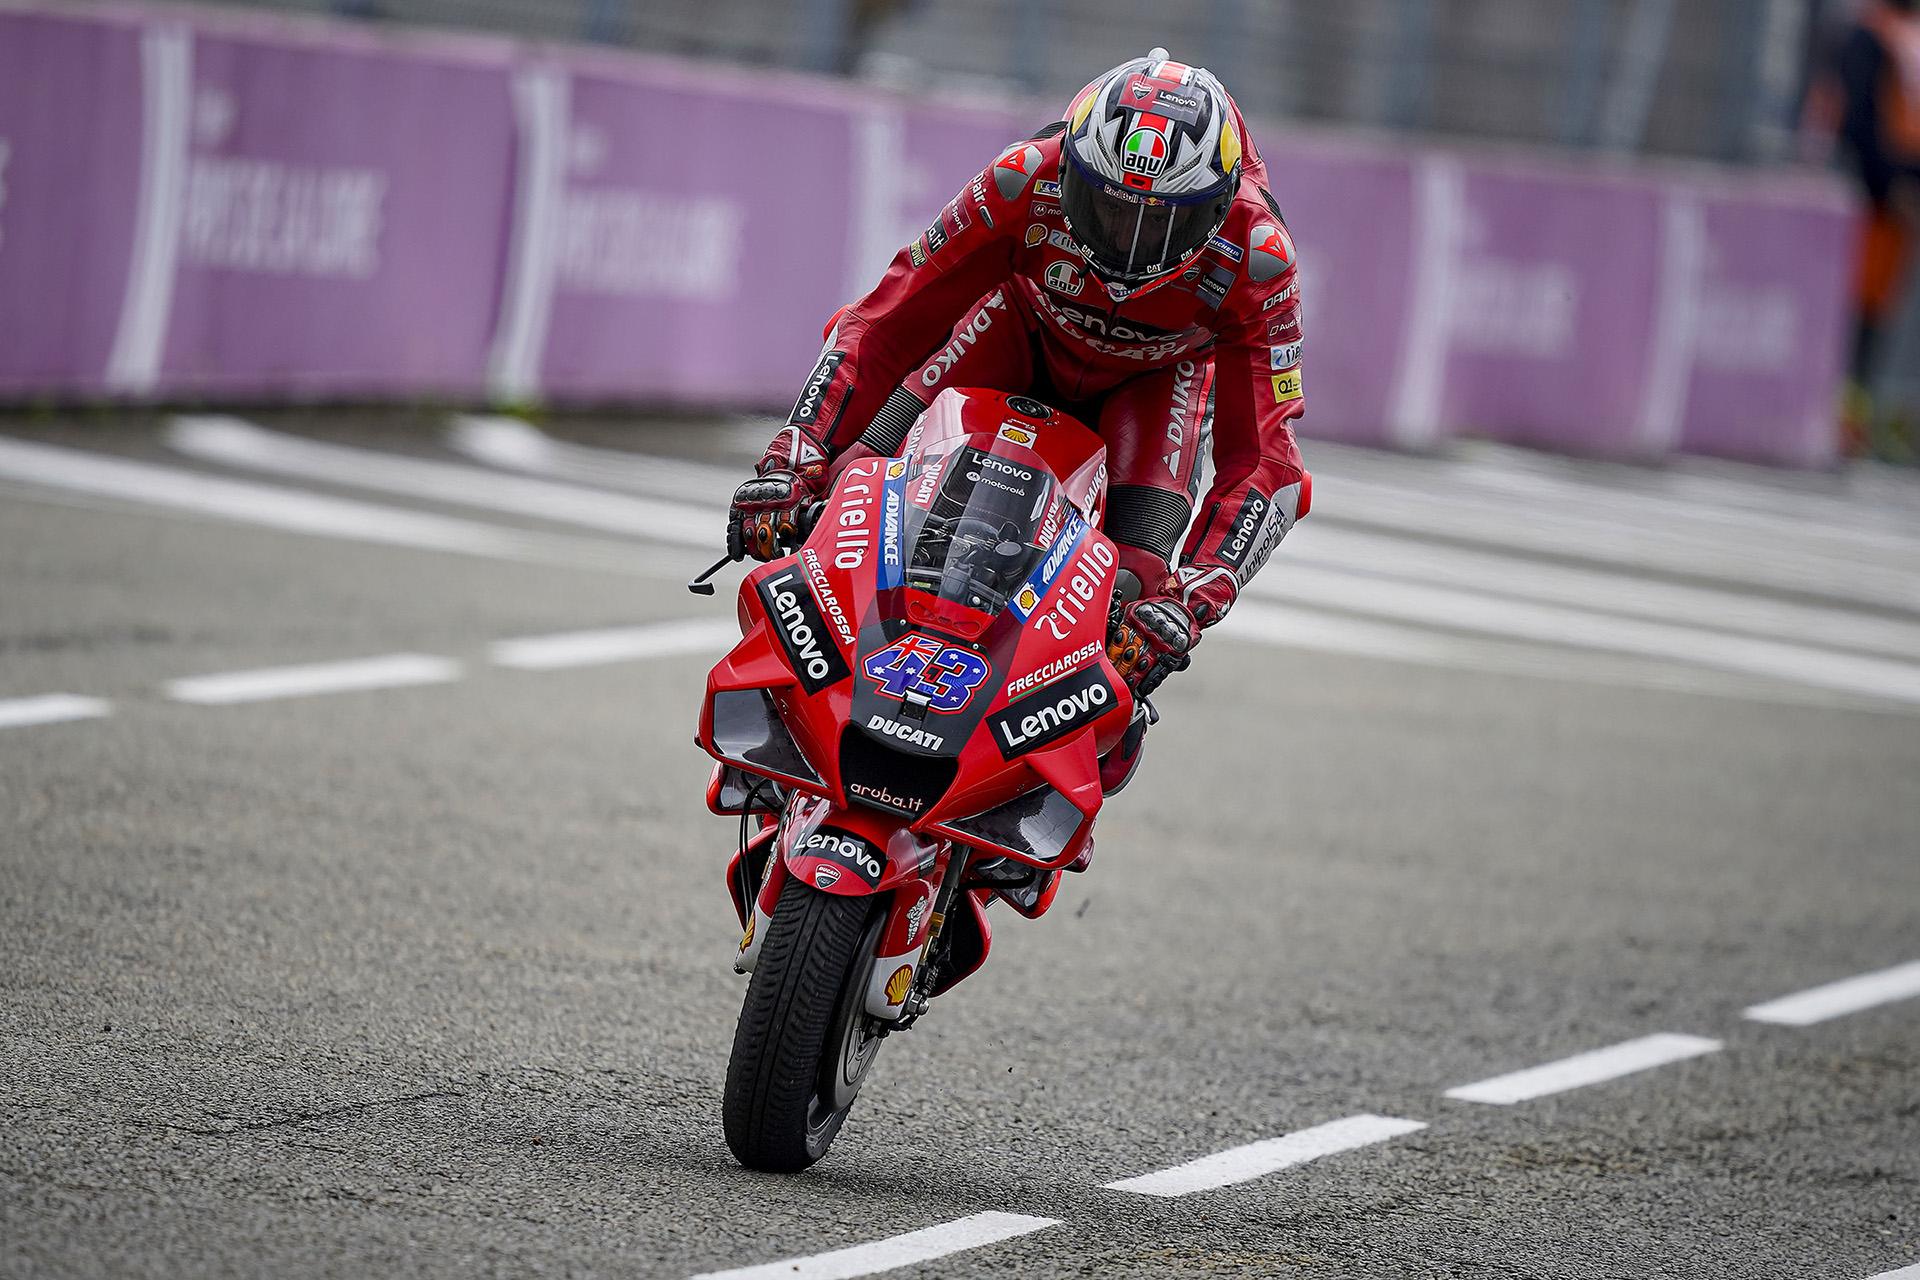 GP Γαλλίας: Νέος θρίαμβος για Jack Miller και Ducati